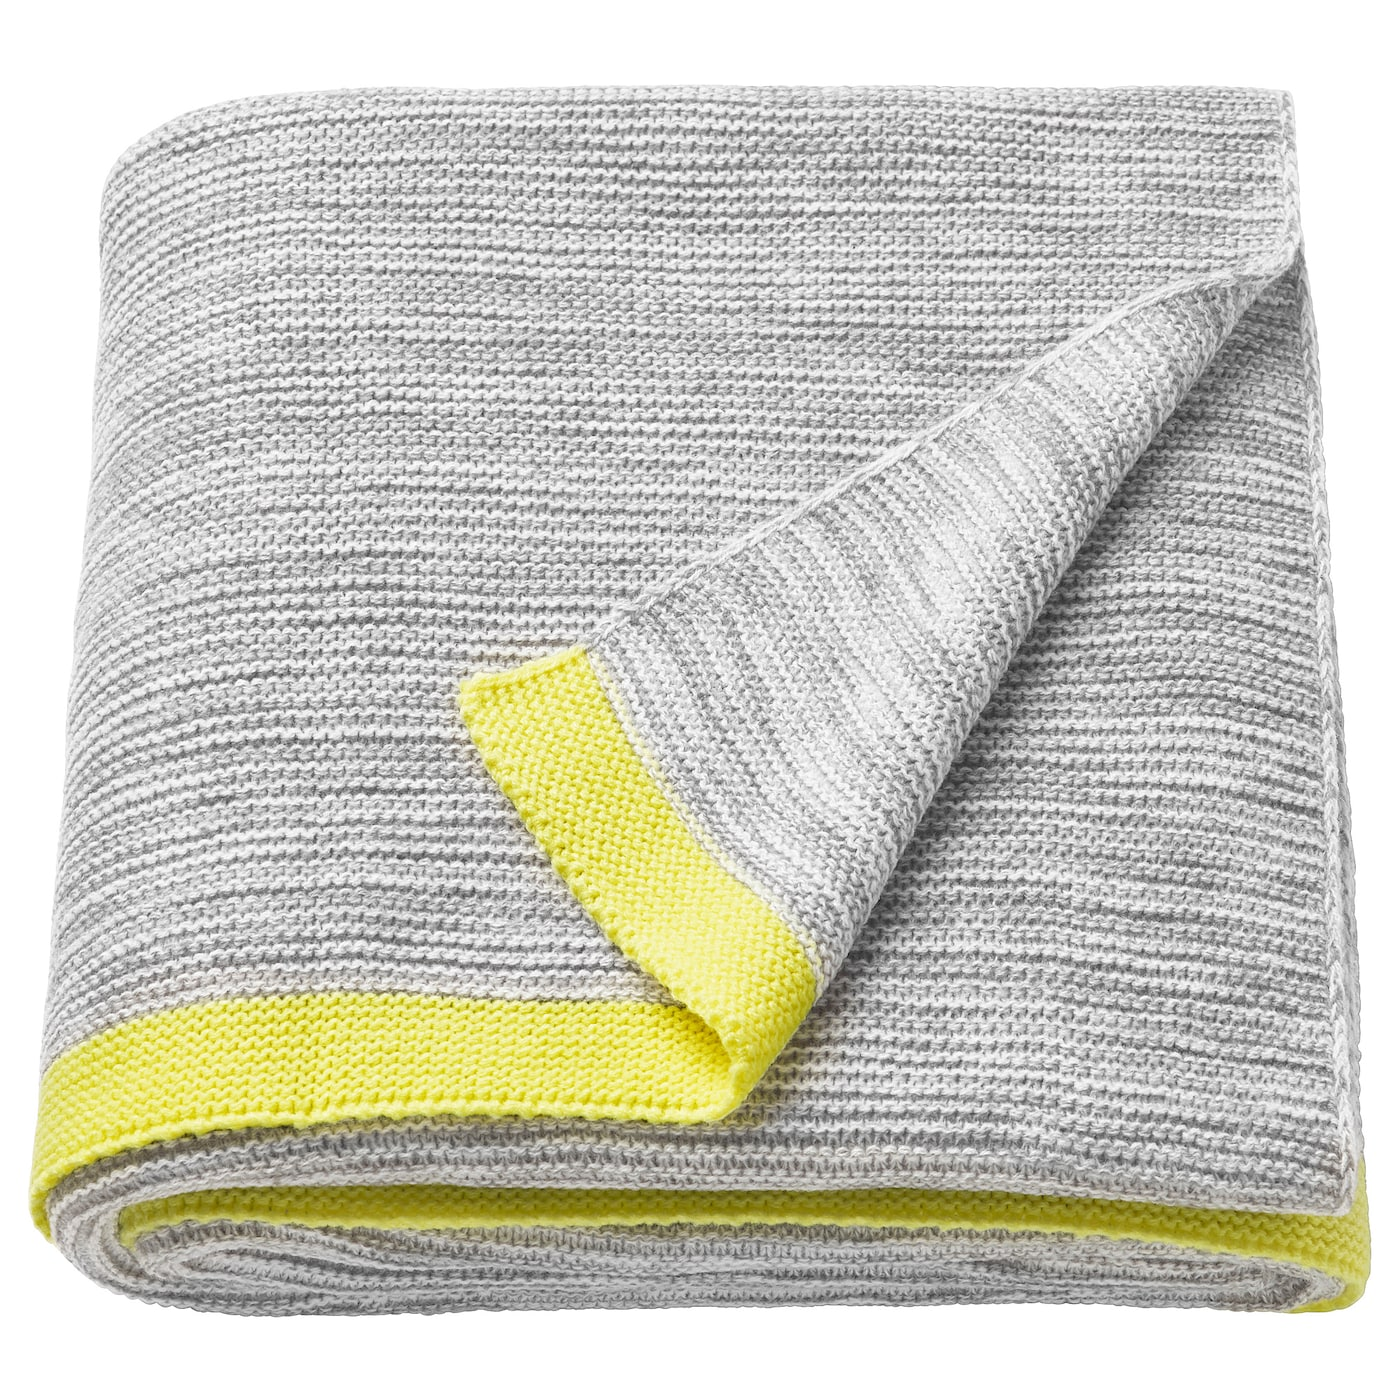 stockholm tapis tiss plat fait main motif filet jaune 170 x 240 cm ikea. Black Bedroom Furniture Sets. Home Design Ideas